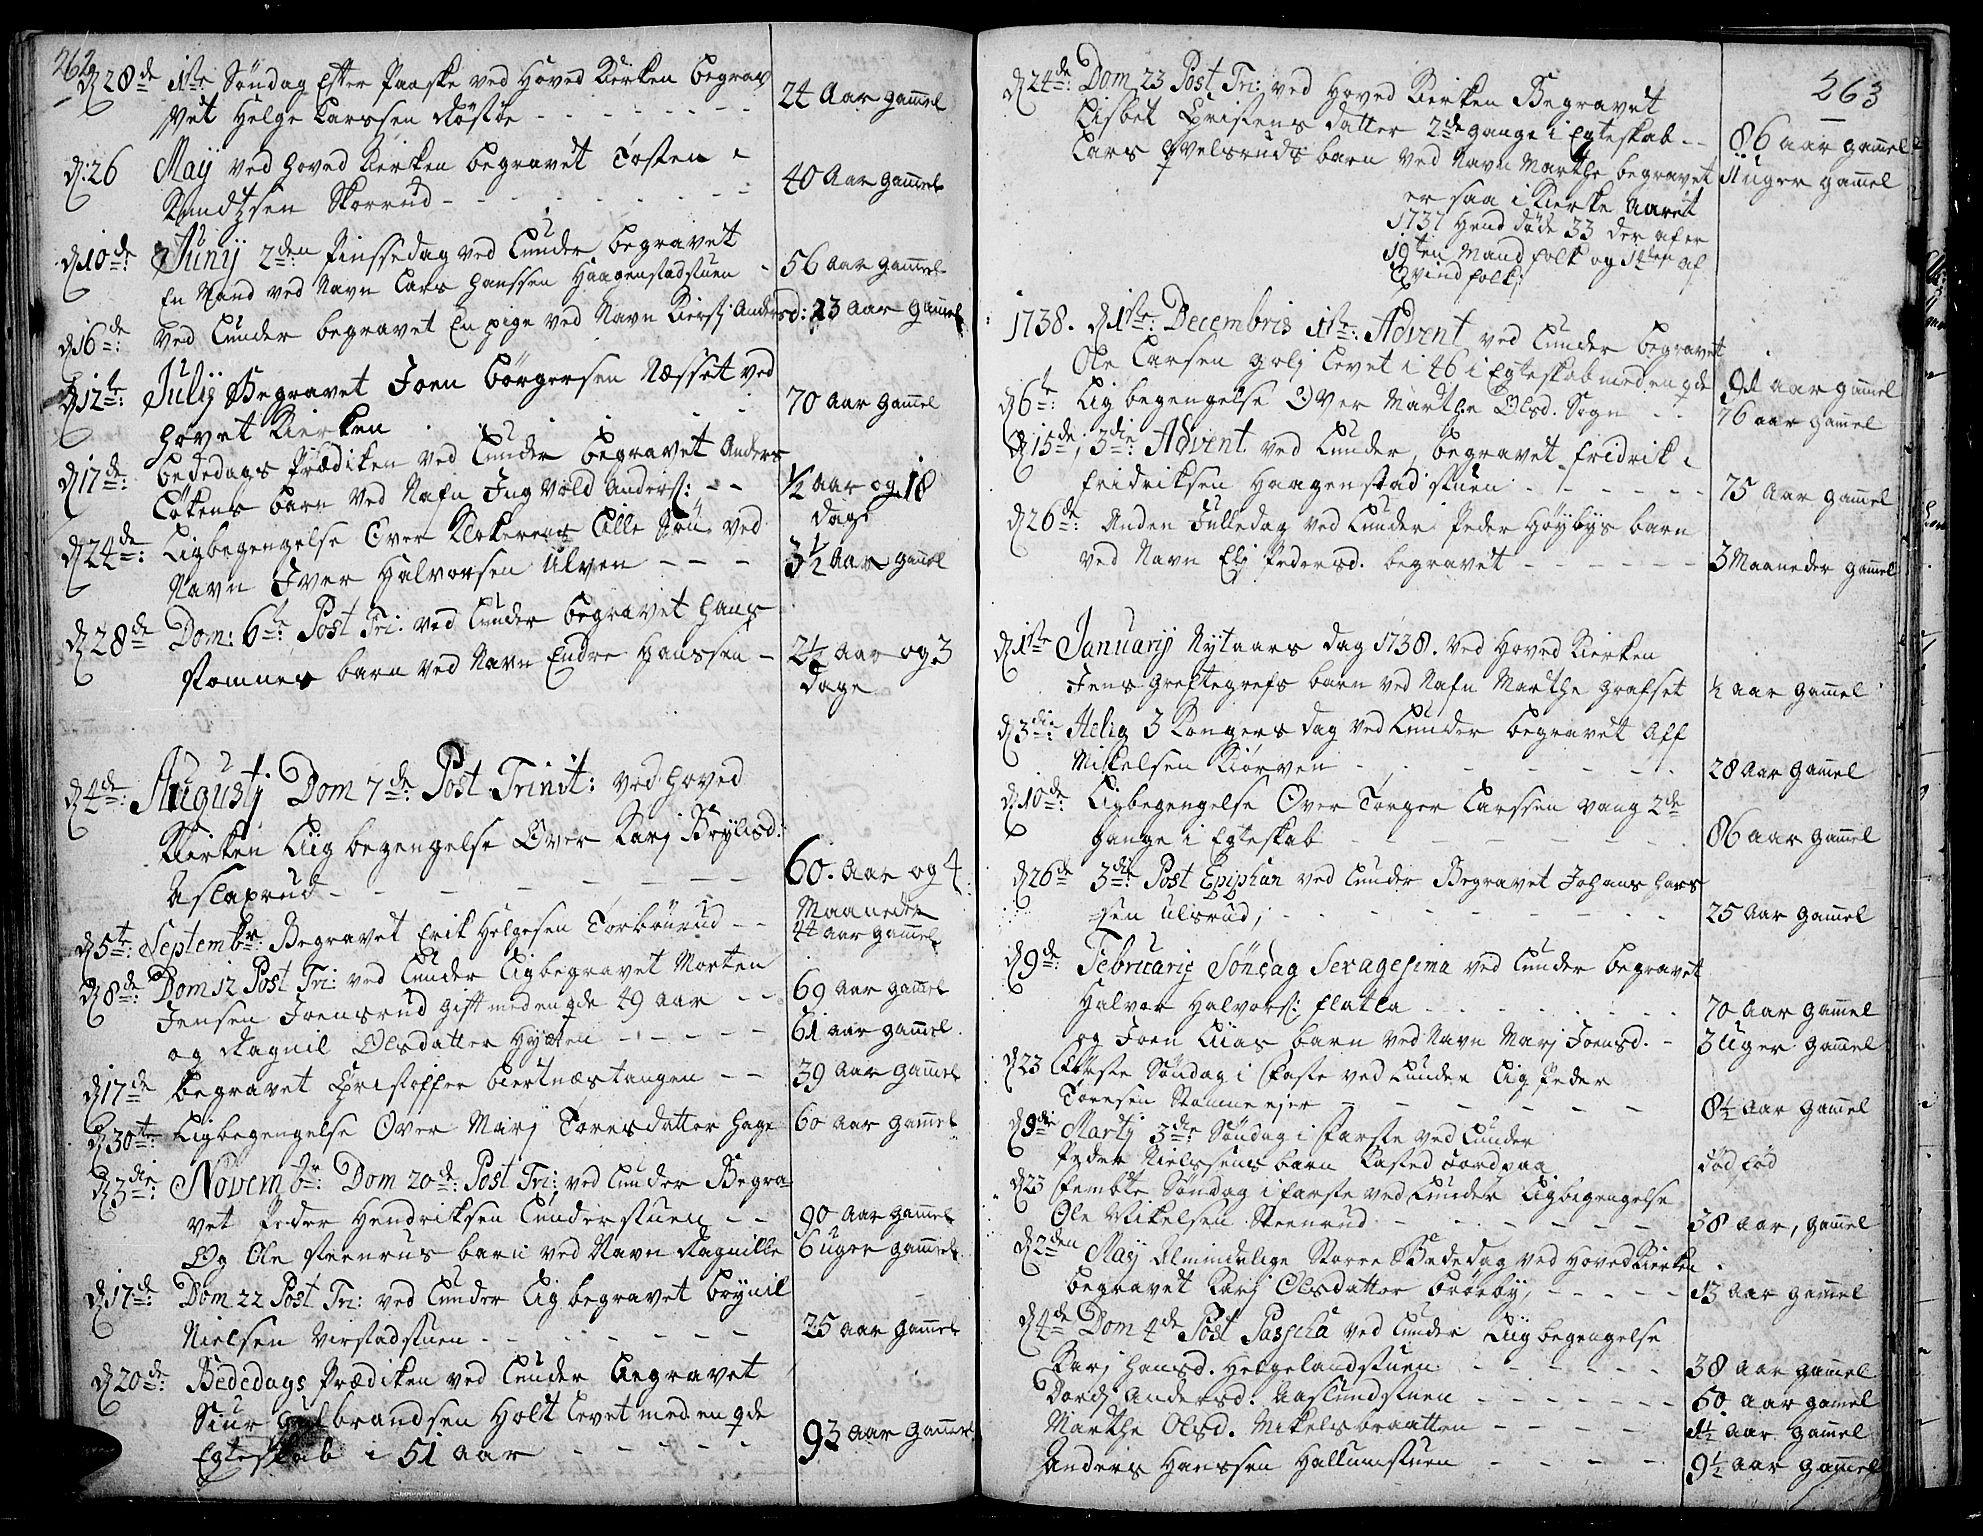 SAH, Jevnaker prestekontor, Ministerialbok nr. 2, 1725-1751, s. 262-263